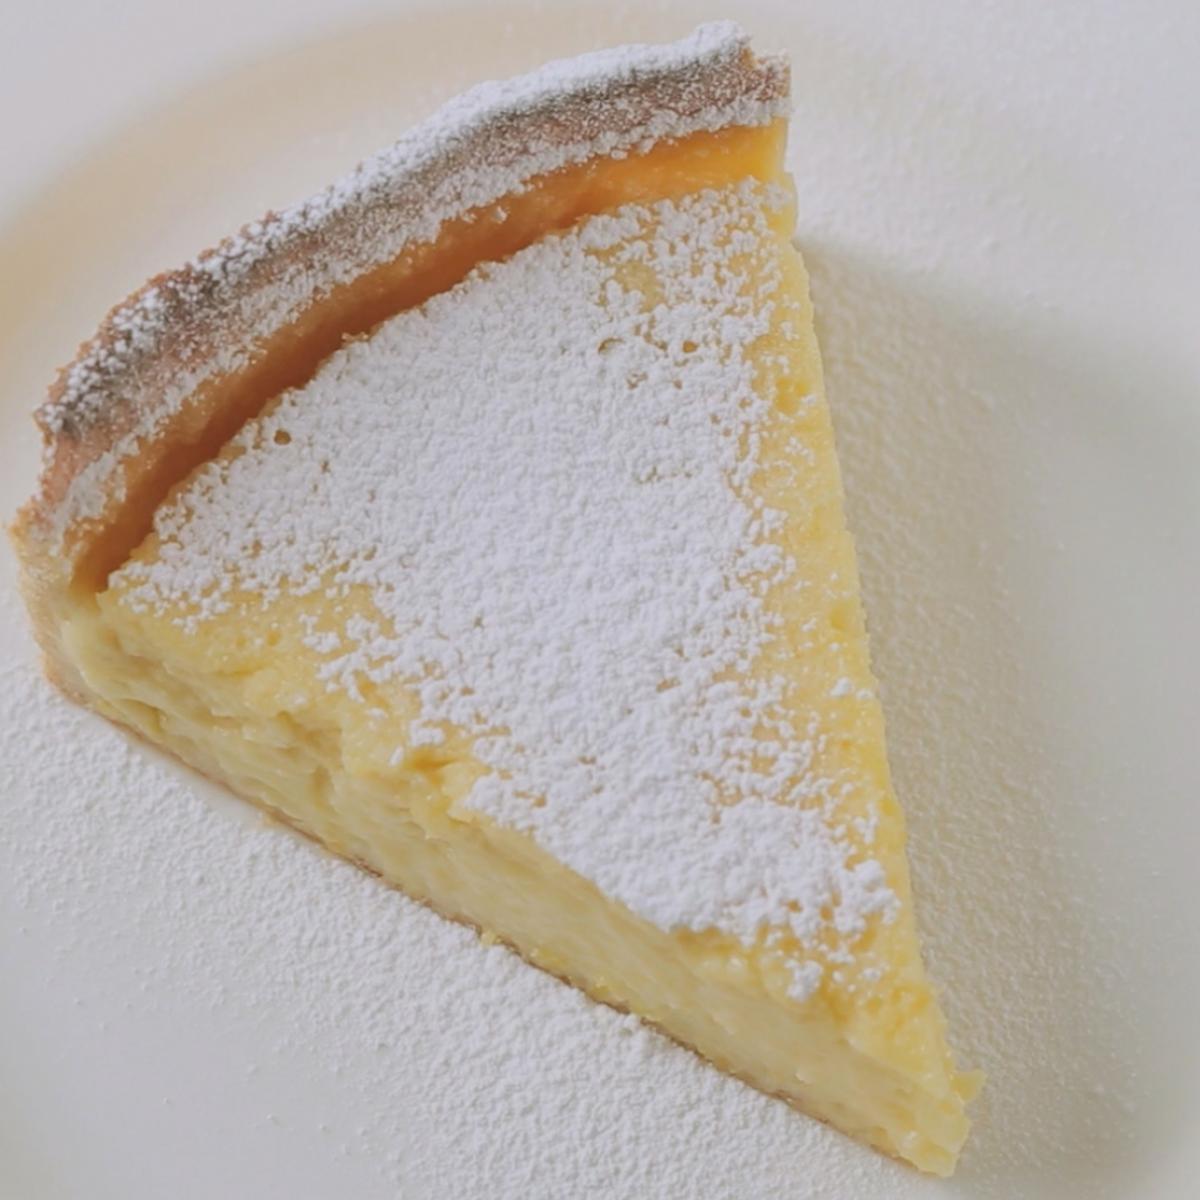 resimli tarif: lemon cake recipe delia smith [24]